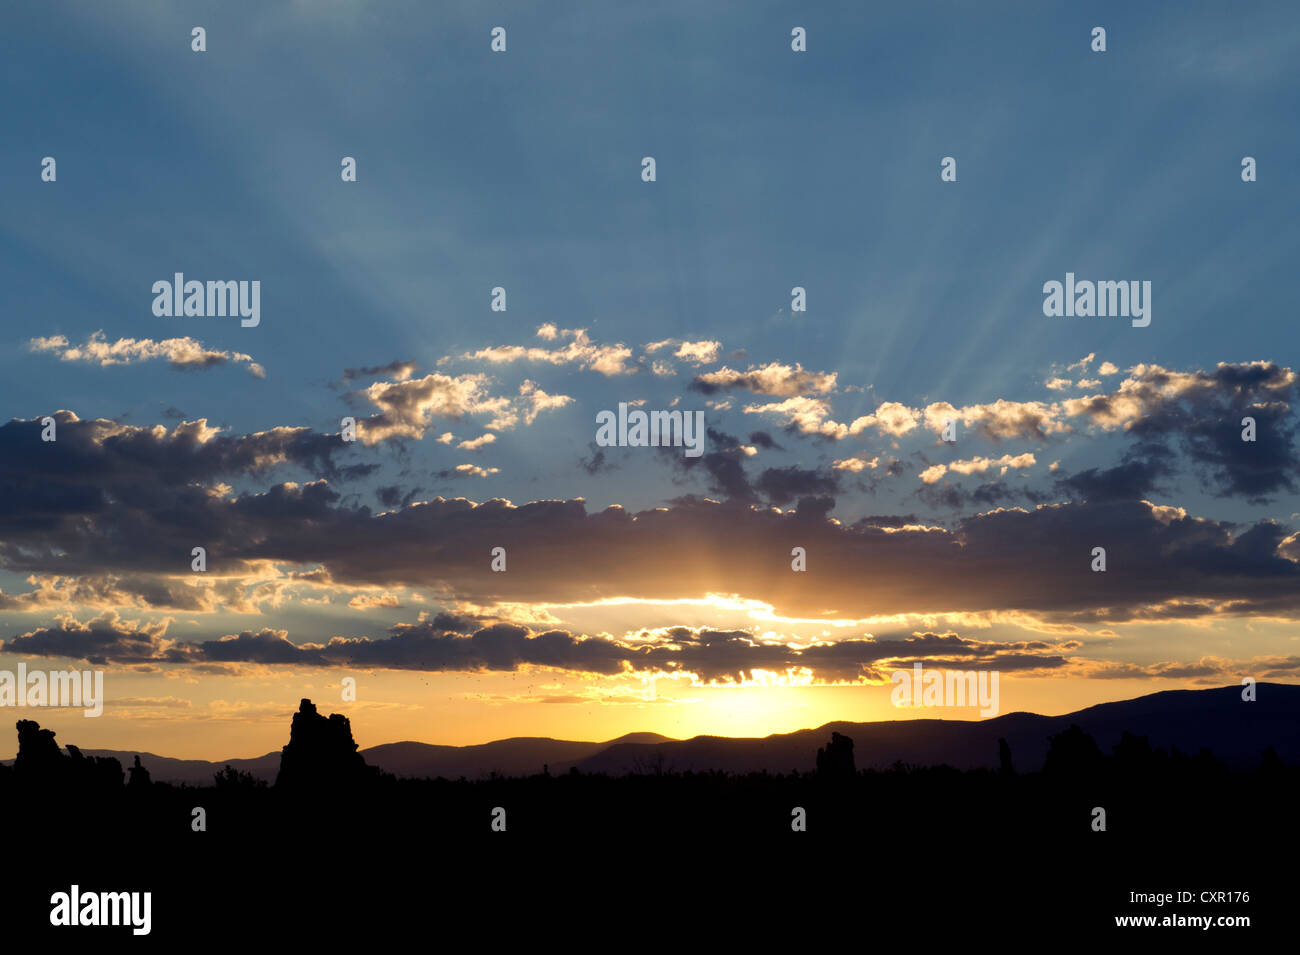 Sunlight and clouds, mono lake, california, usa - Stock Image